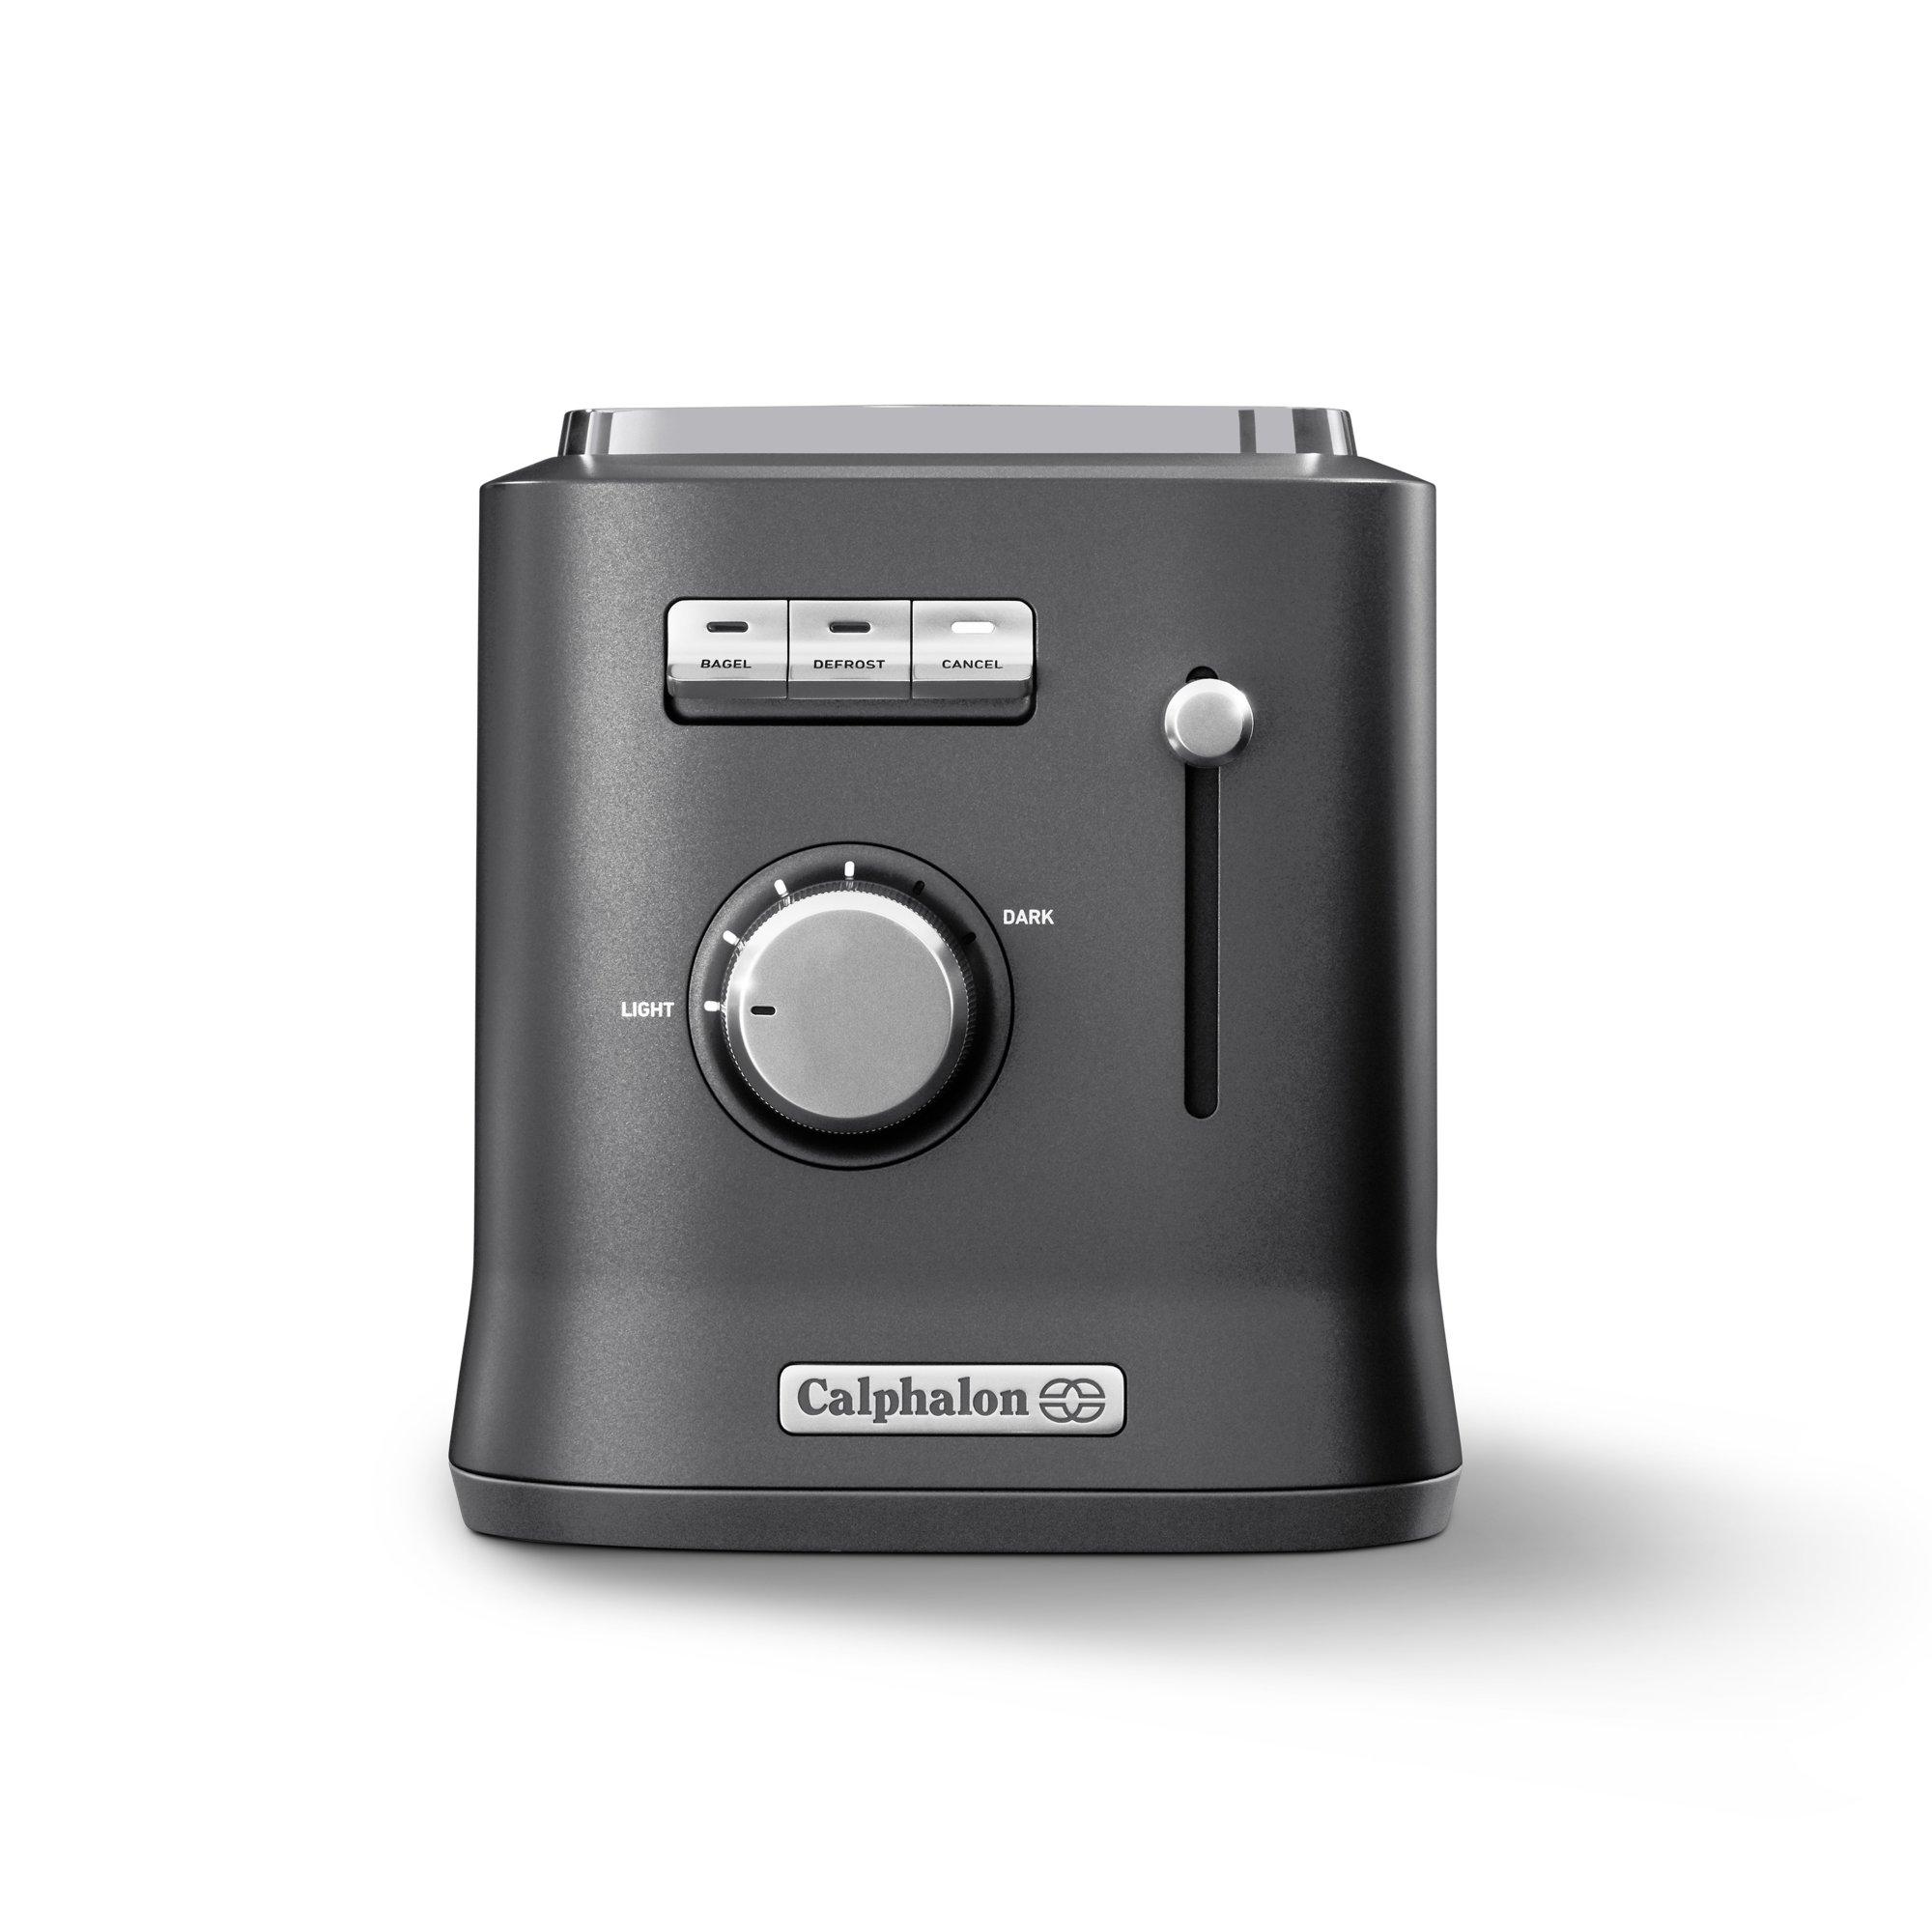 Calphalon IntelliCrisp 2 Slice Toaster, Grey